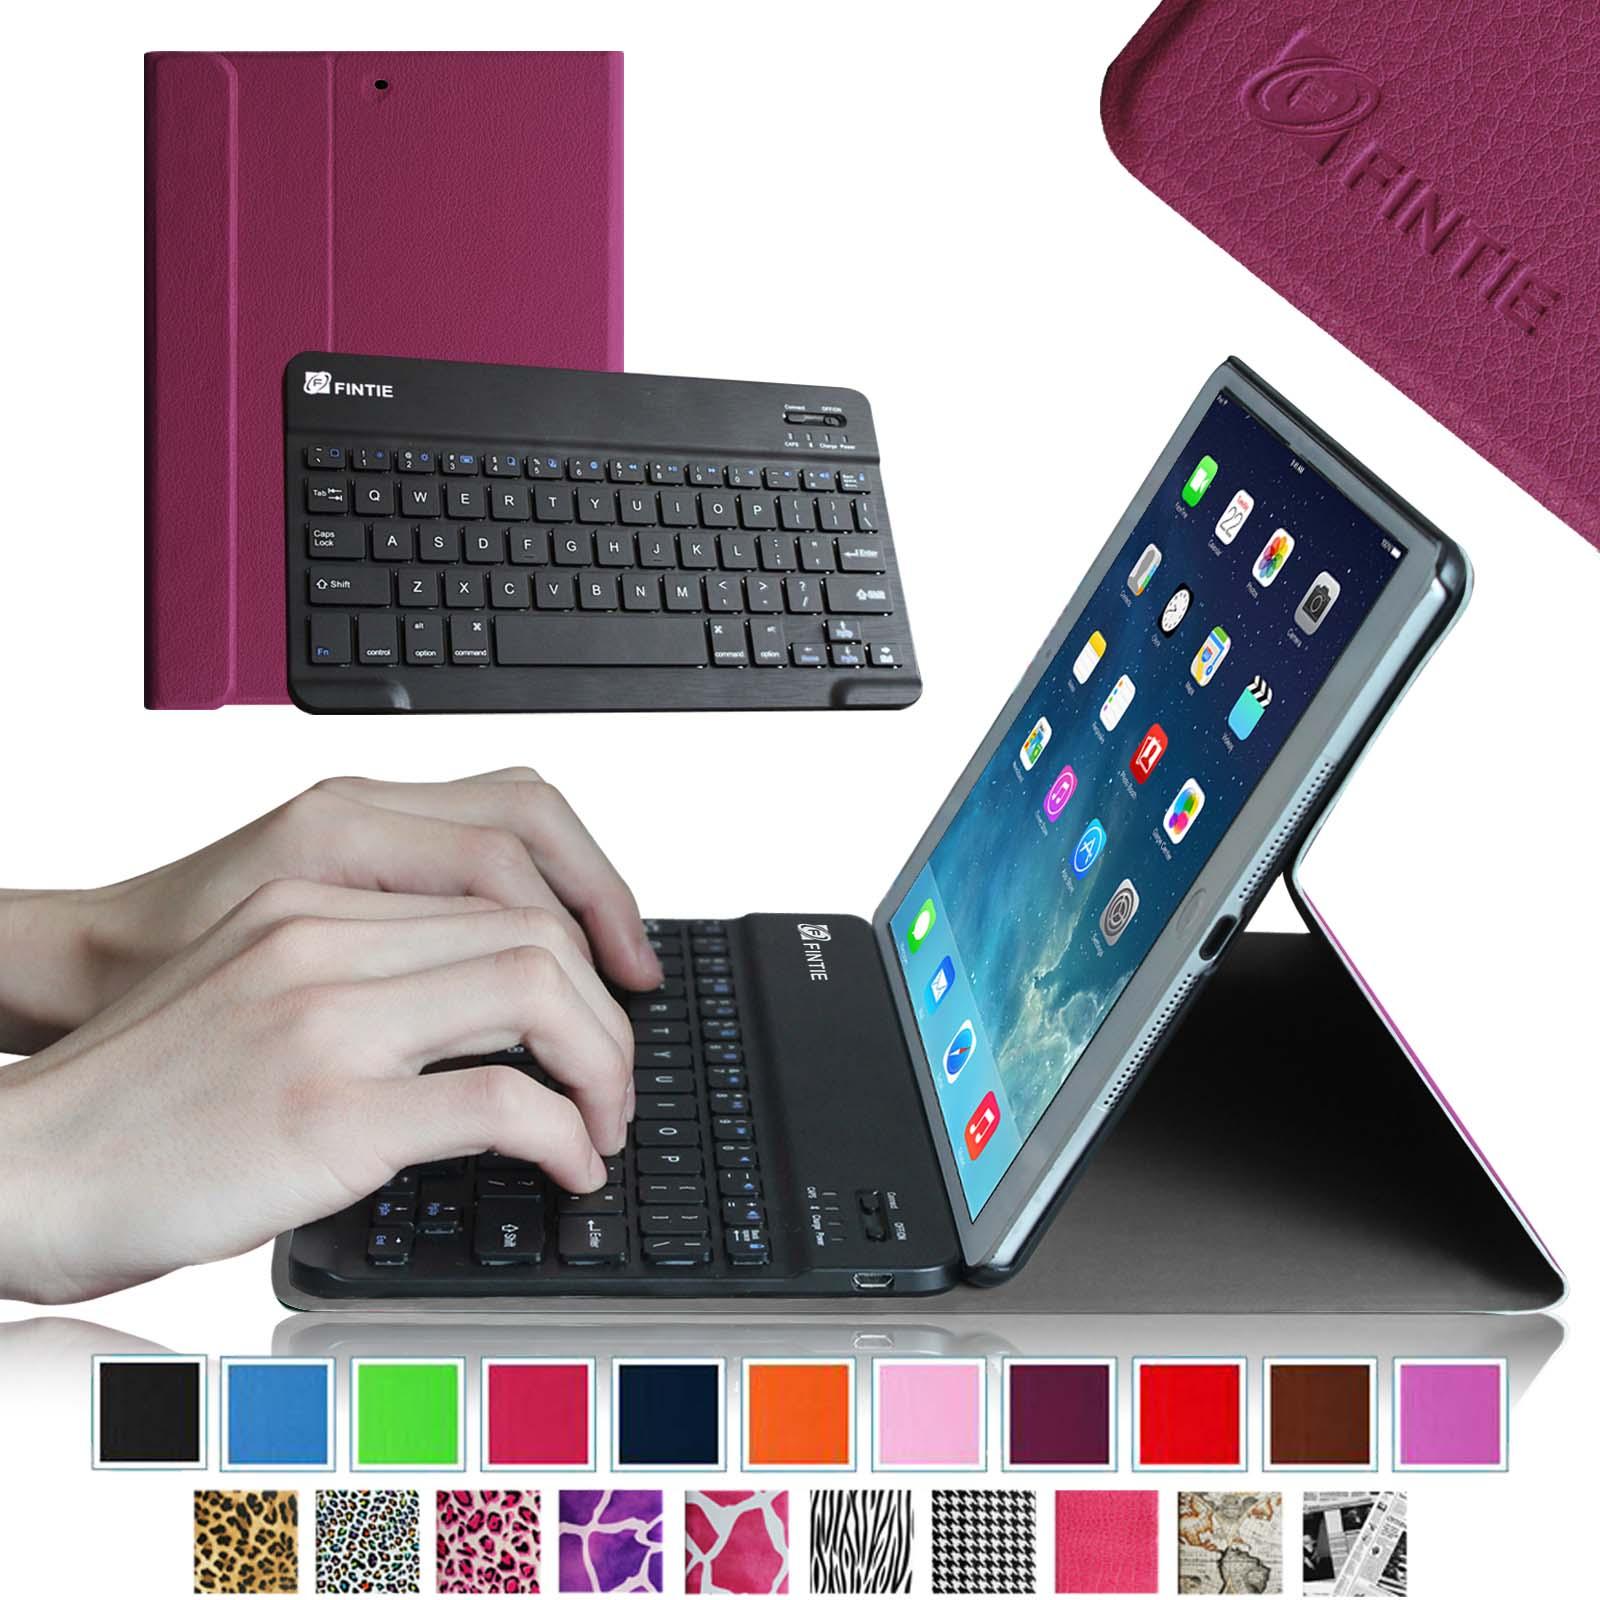 iPad mini 3 / iPad mini 2 / iPad mini Keyboard Case - Fintie SlimShell Cover with Removable Bluetooth Keyboard, Purple